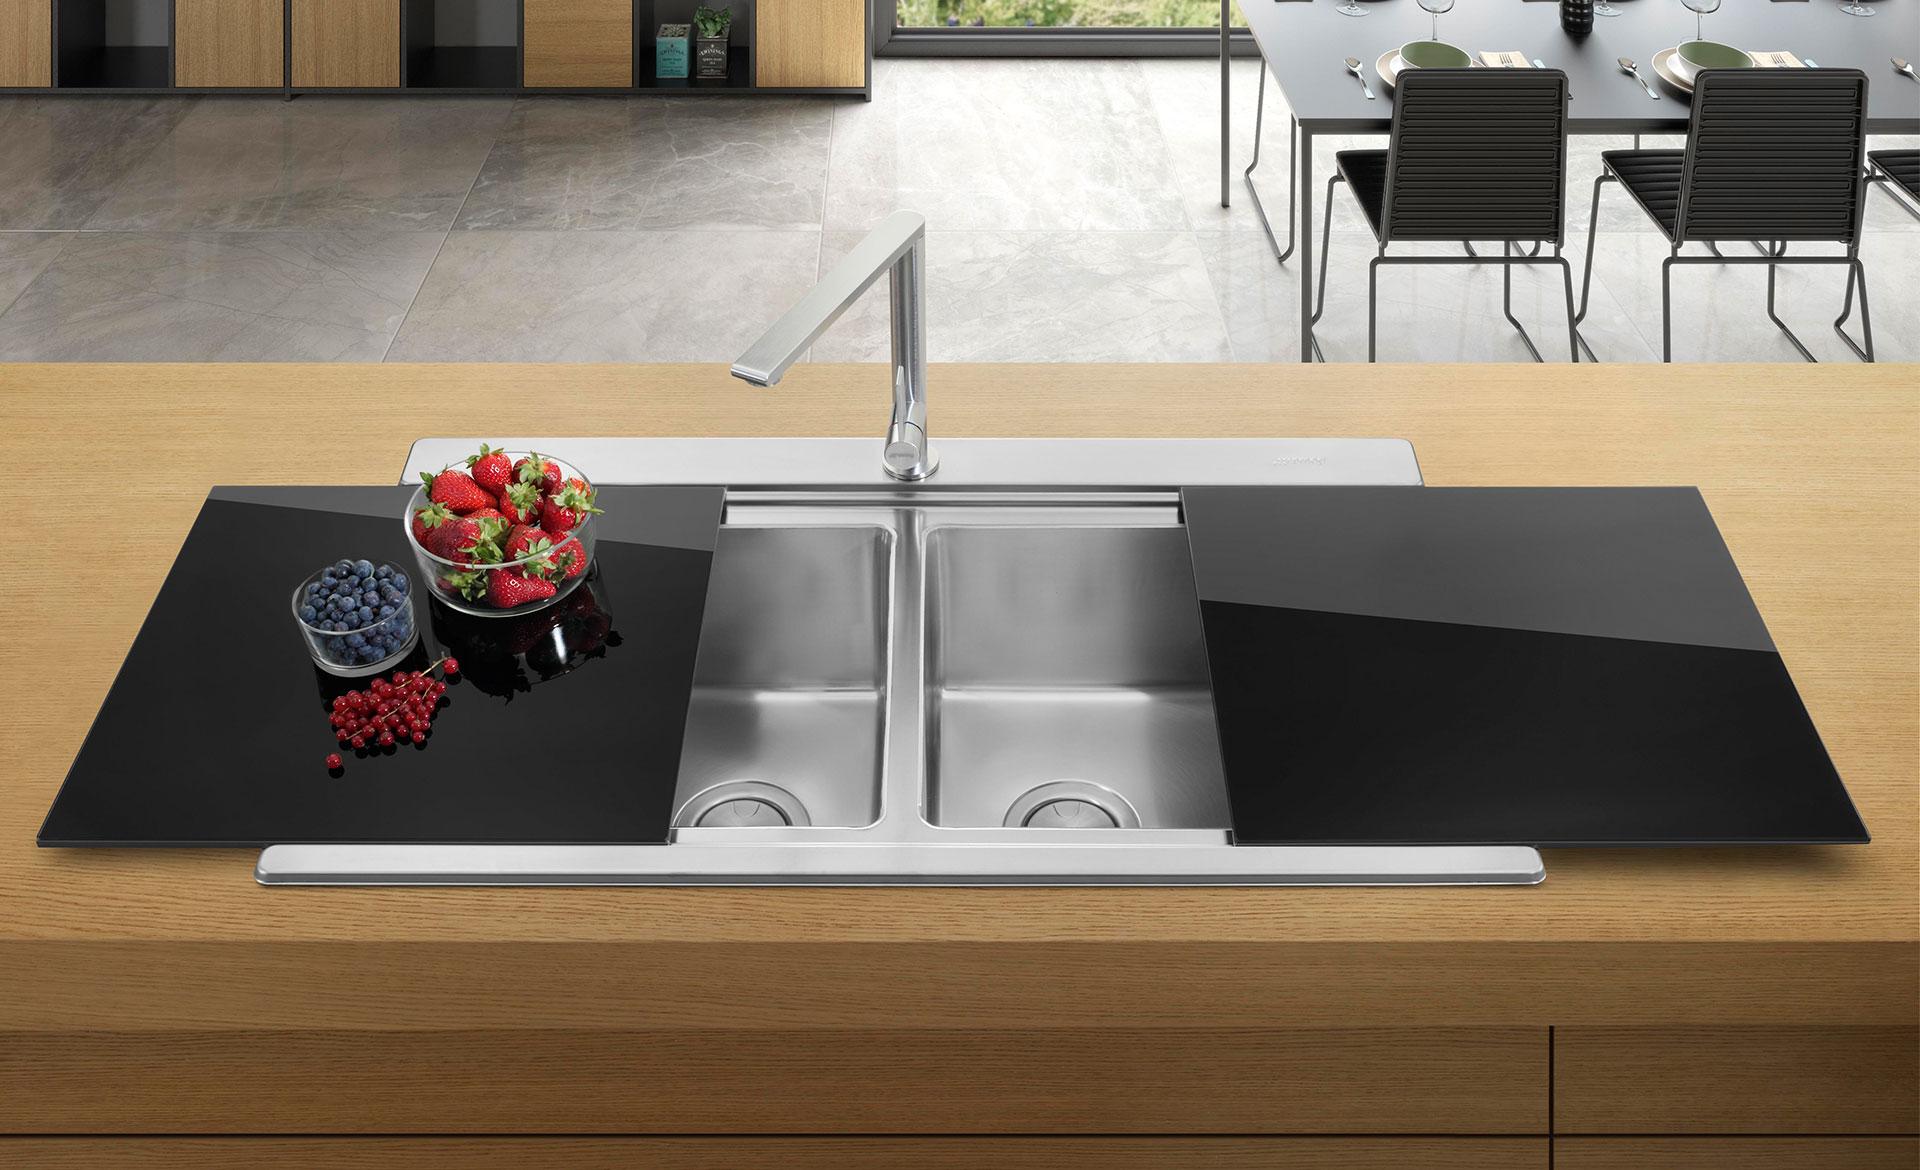 smeg mira black glass stainless steel sink cover set 407 x 446 x 7mm